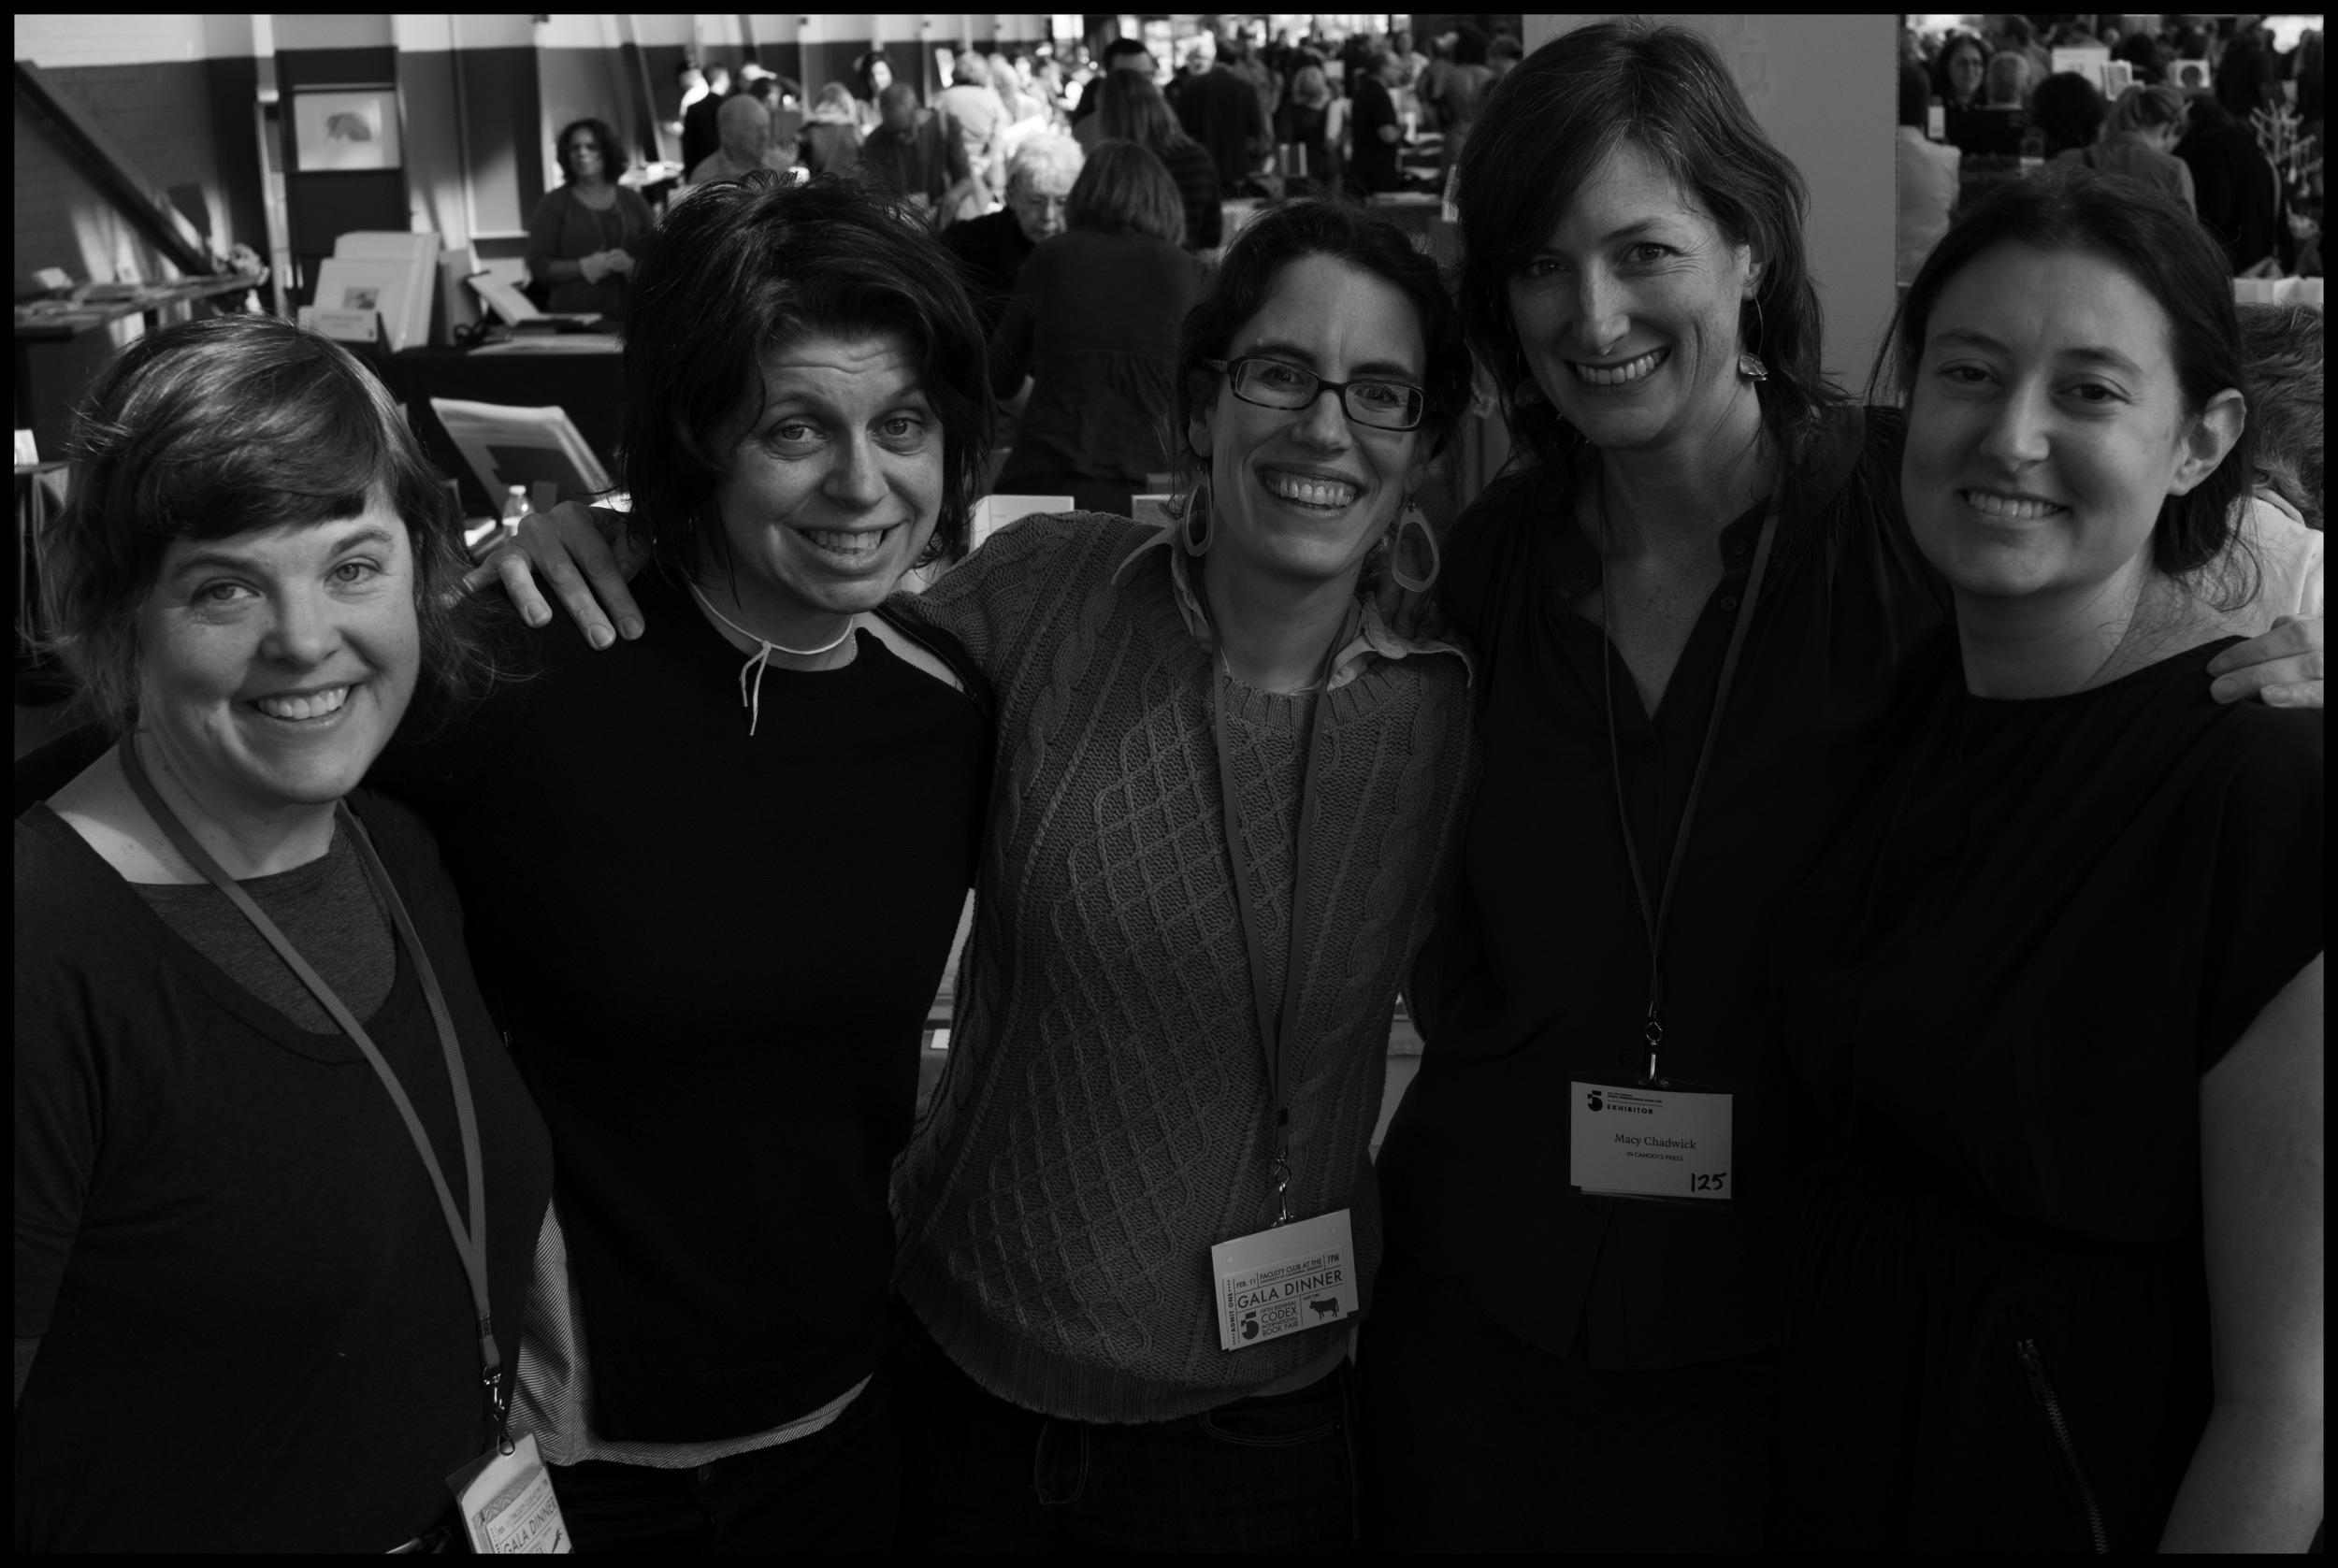 Katie Baldwin, Tricia Treacy, Sarah Bryant, Macy Chadwick, Denise Bookwalter  (photo credit: Clifton Meador)